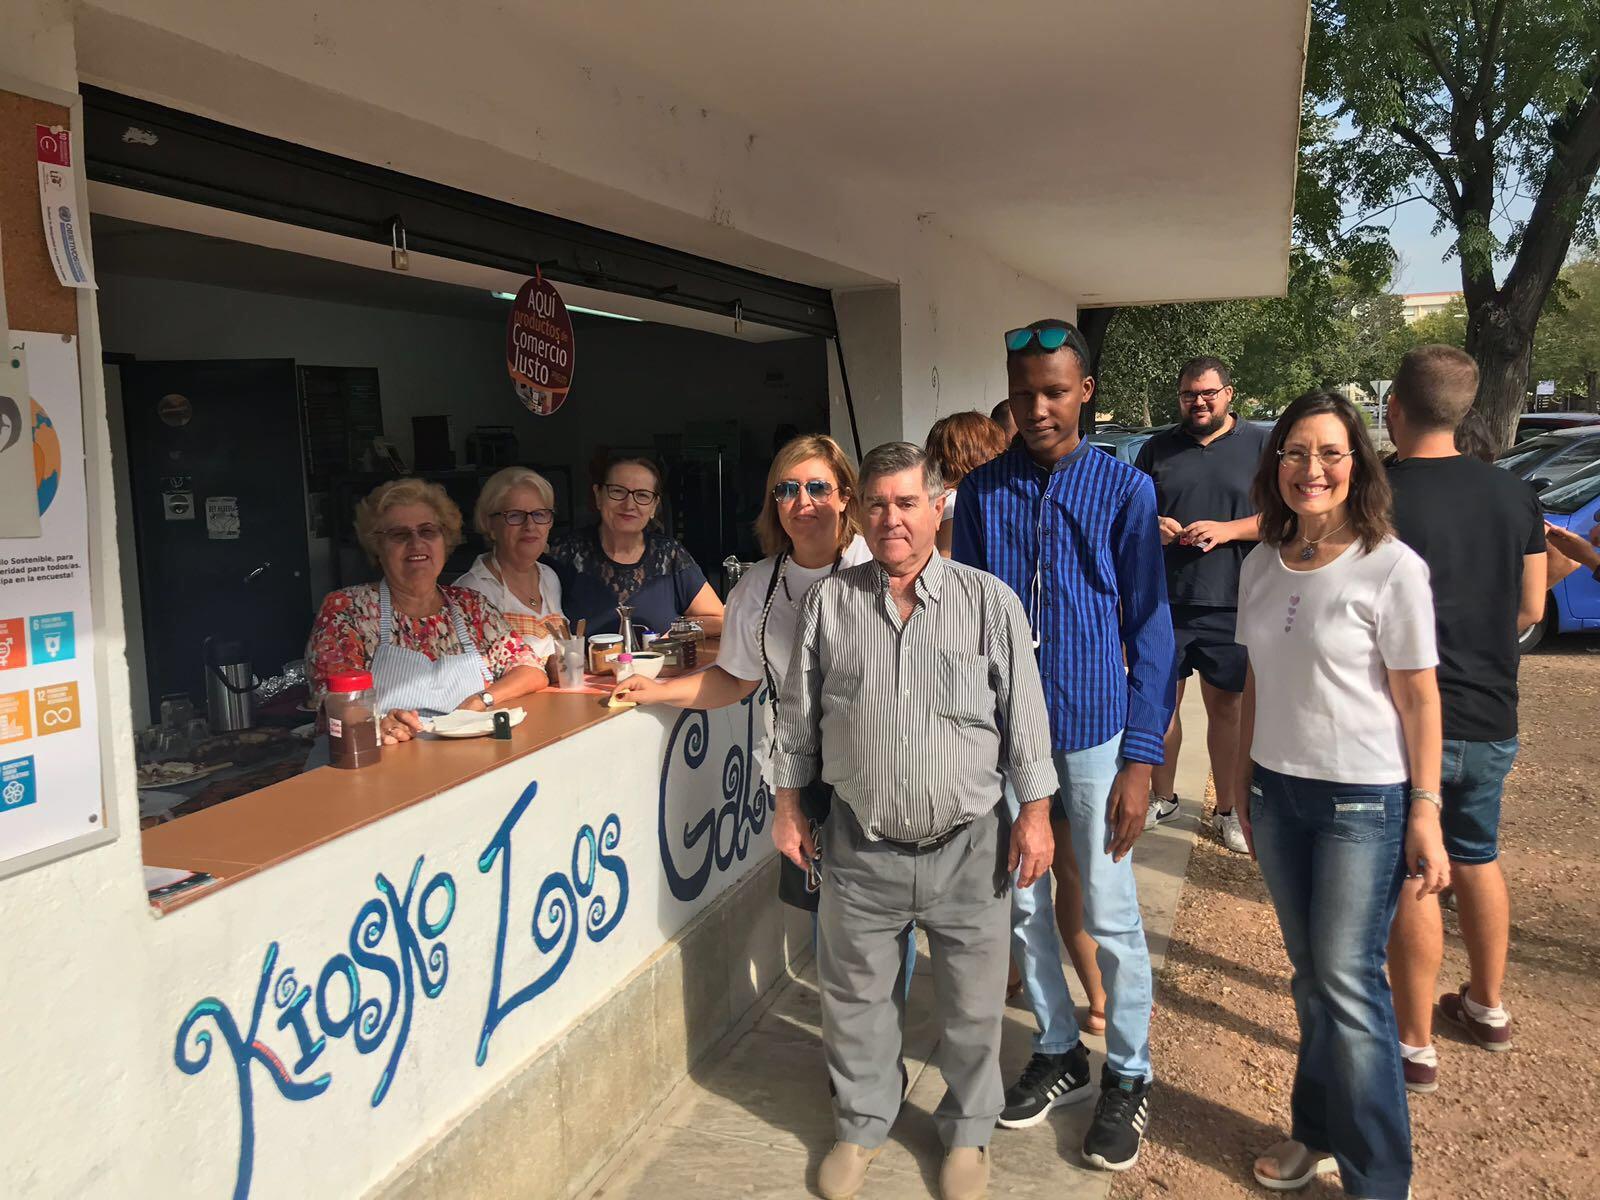 fotnot cordoba kiosko desayuno solidario ayuda infancia